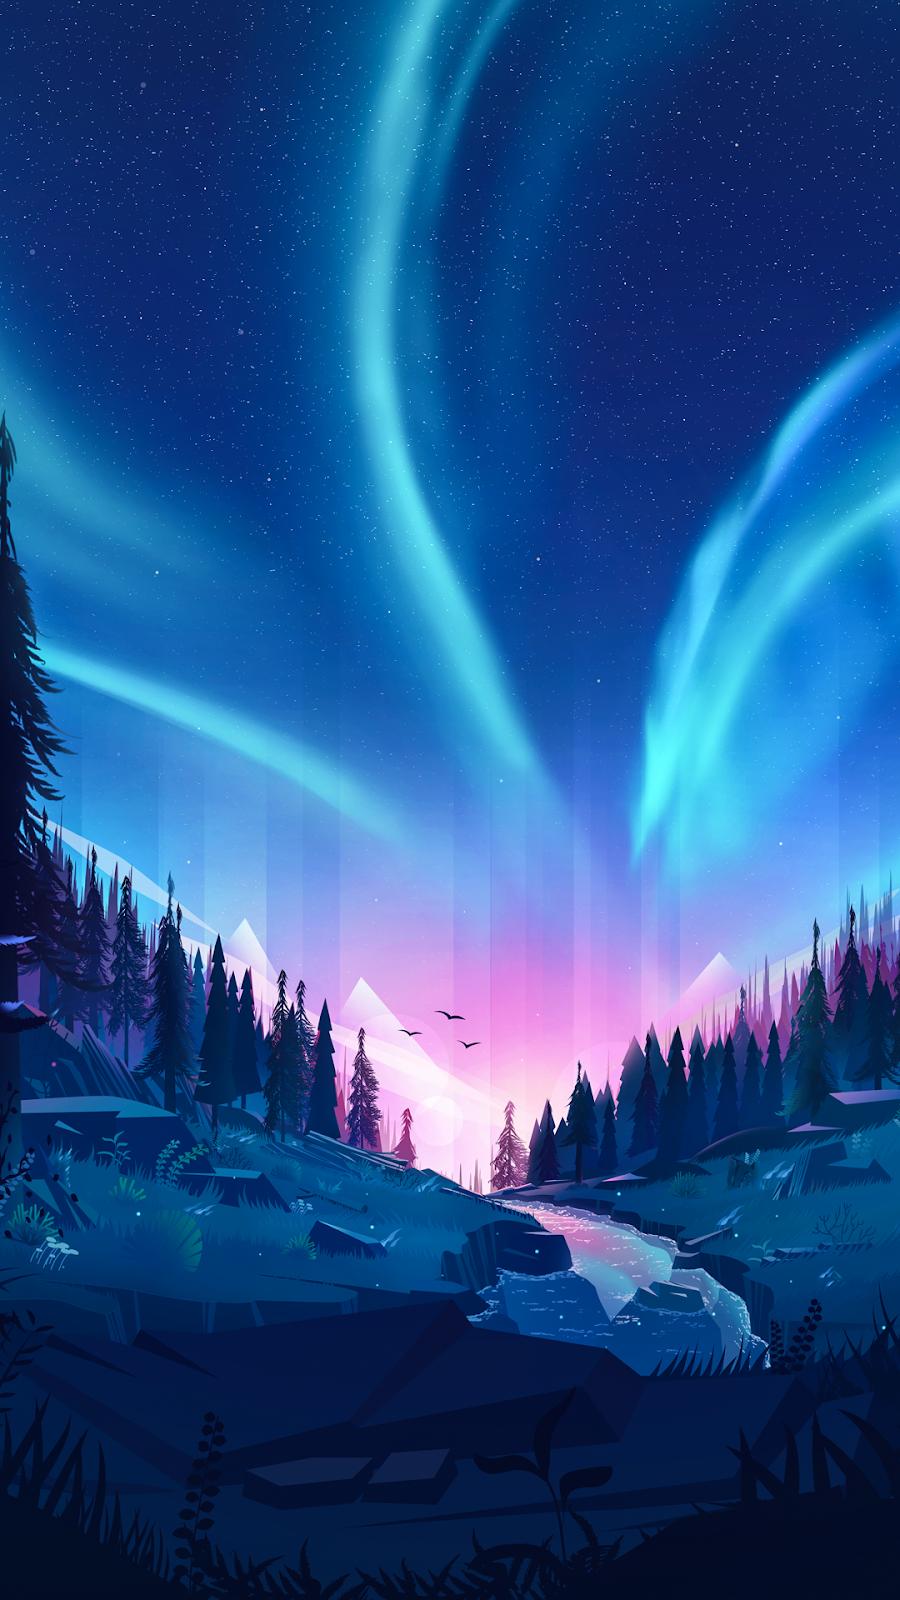 Falling Skies Wallpaper Hd Auroral Forest By Sakurachen Beautiful Wallpaper